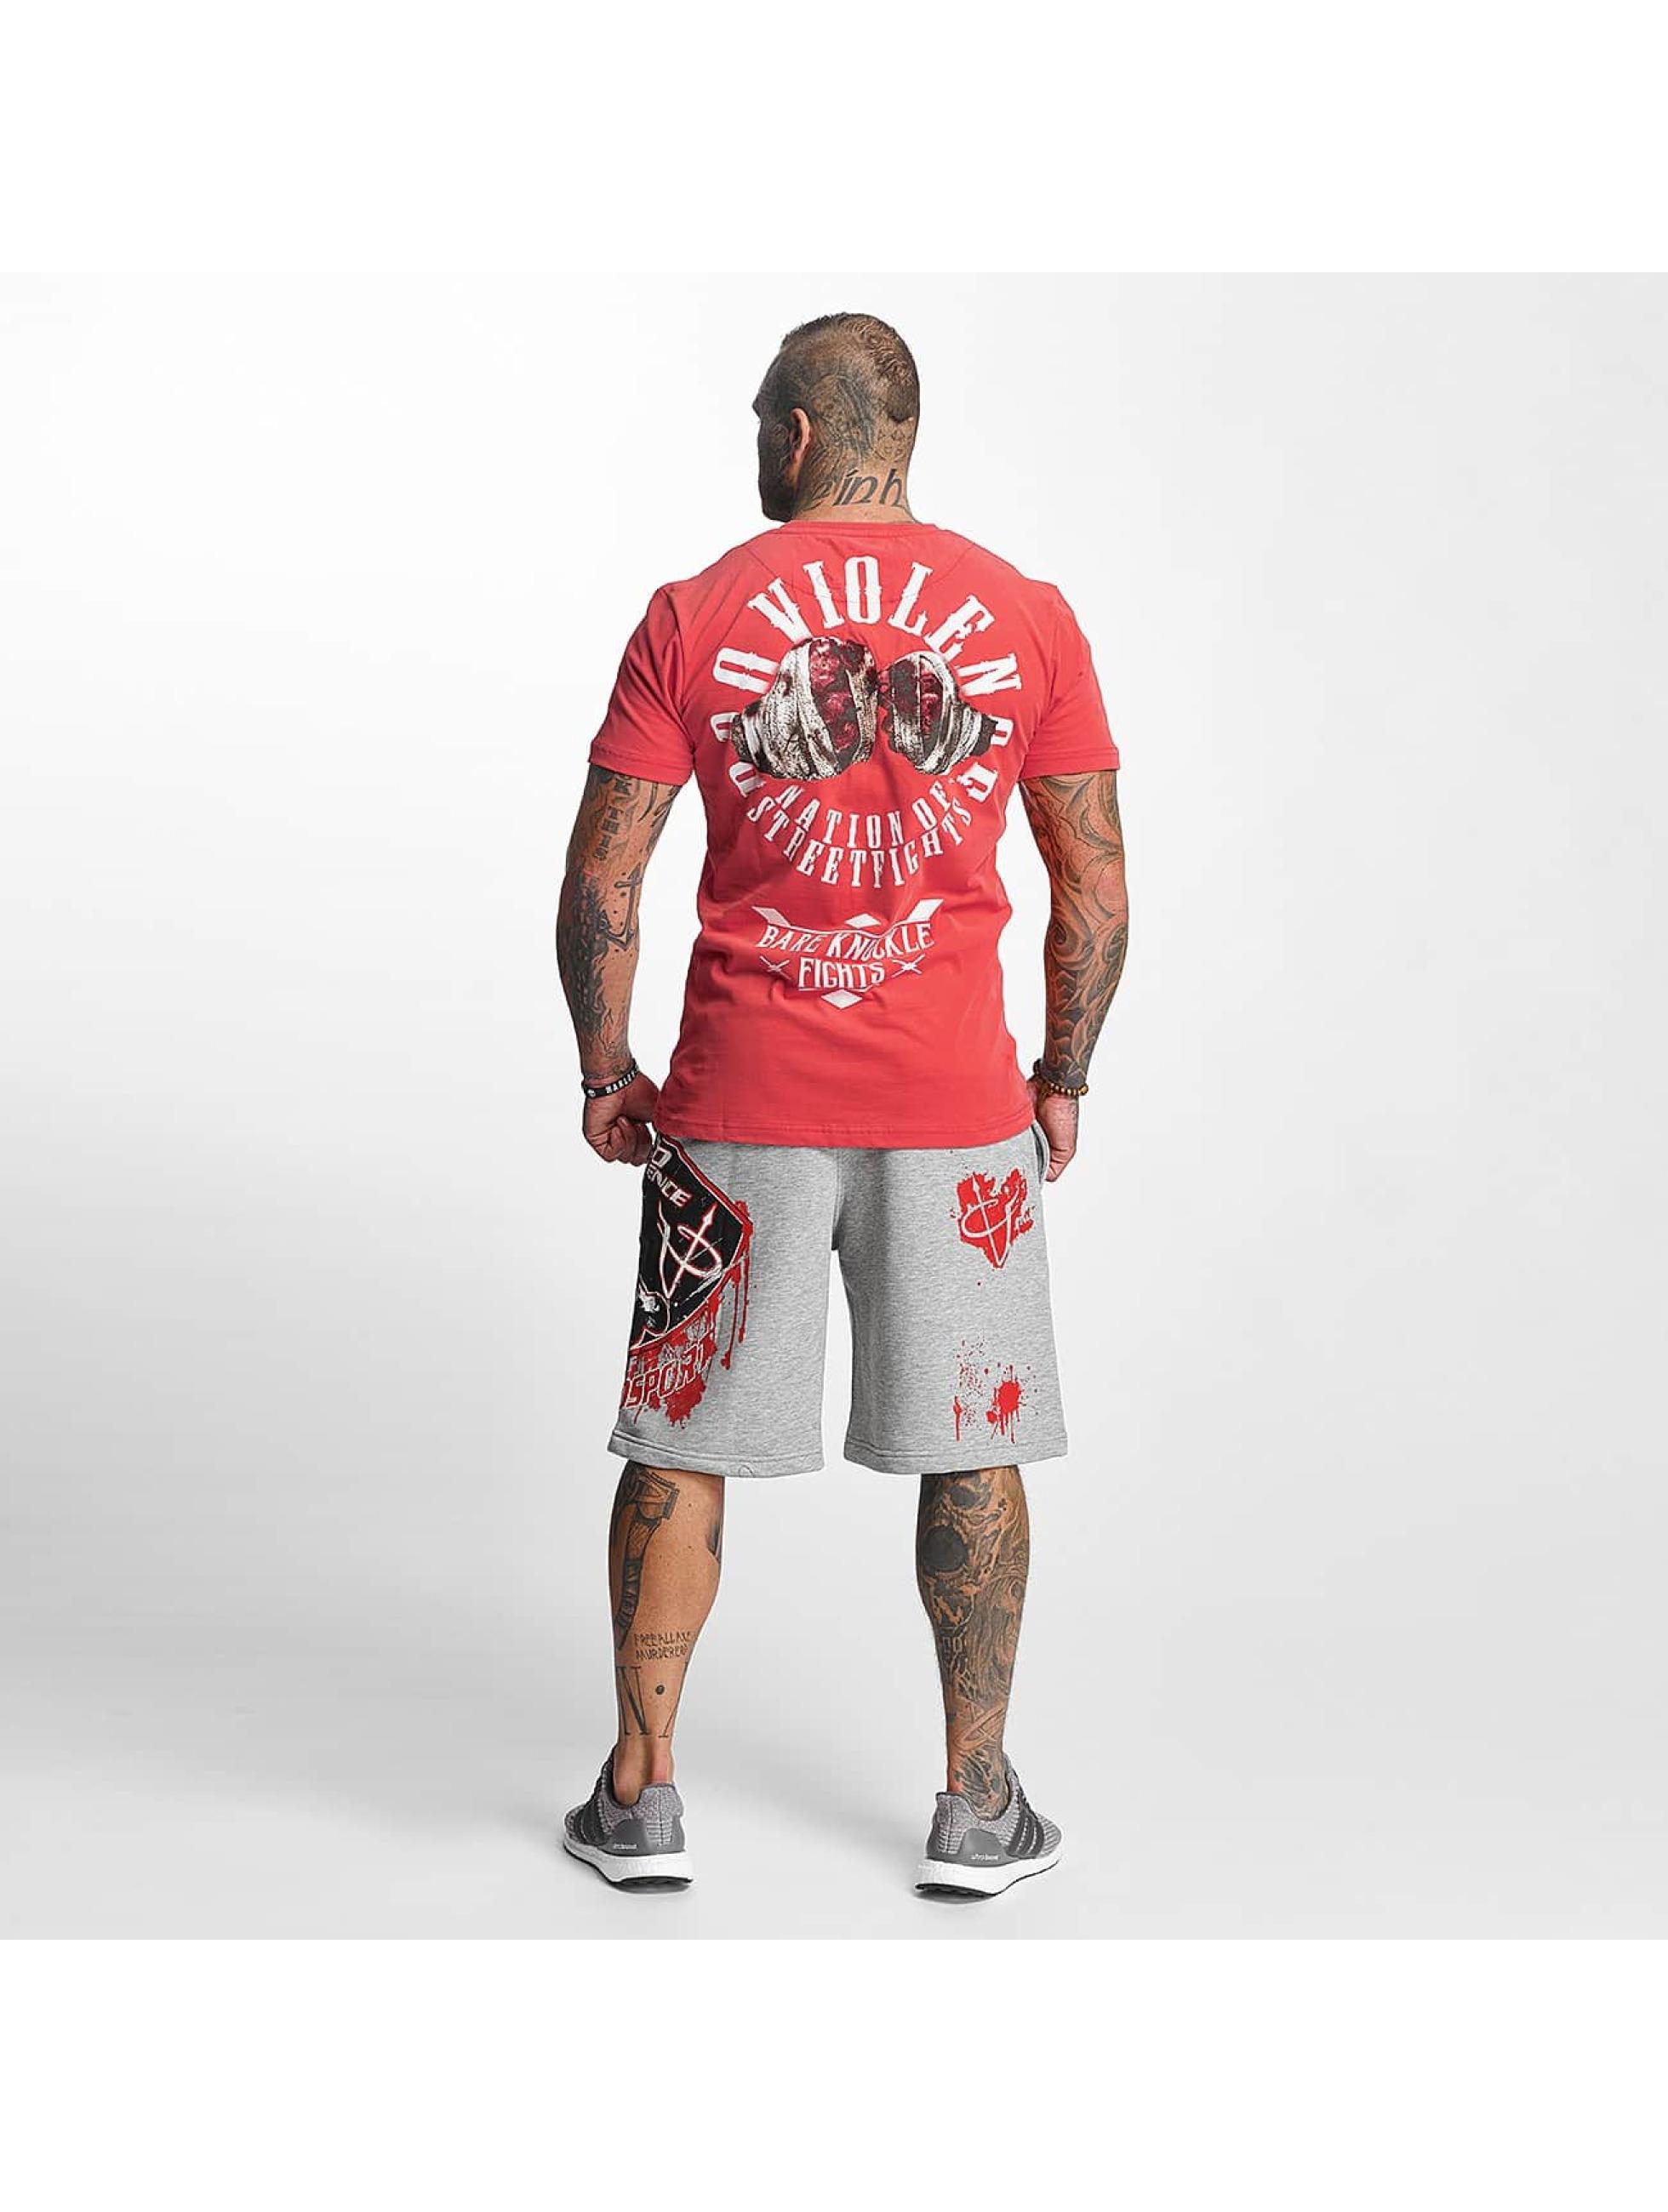 Pro Violence Streetwear t-shirt Knuckle Bare rood